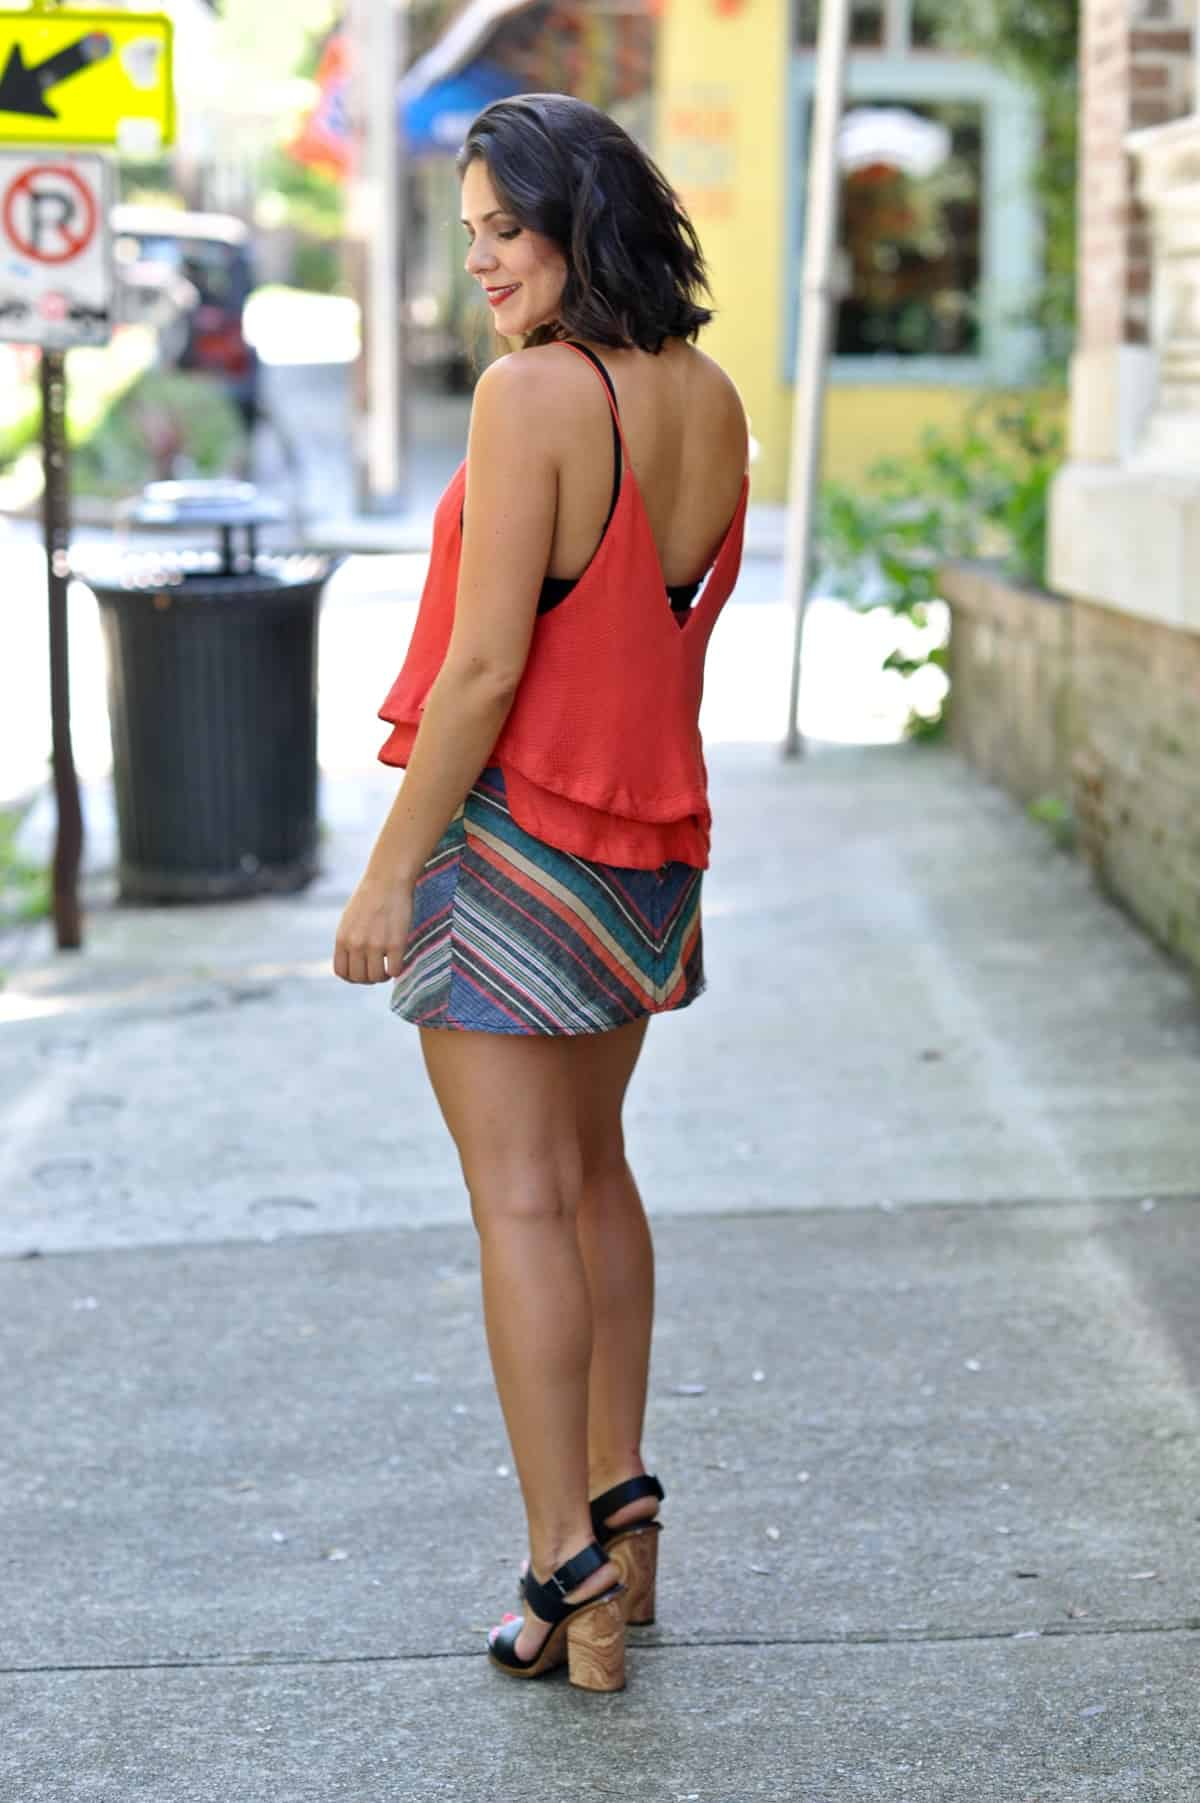 Free People Striped Mini Skirt - summer date night outfit ideas - My Style Vita @mystylevita